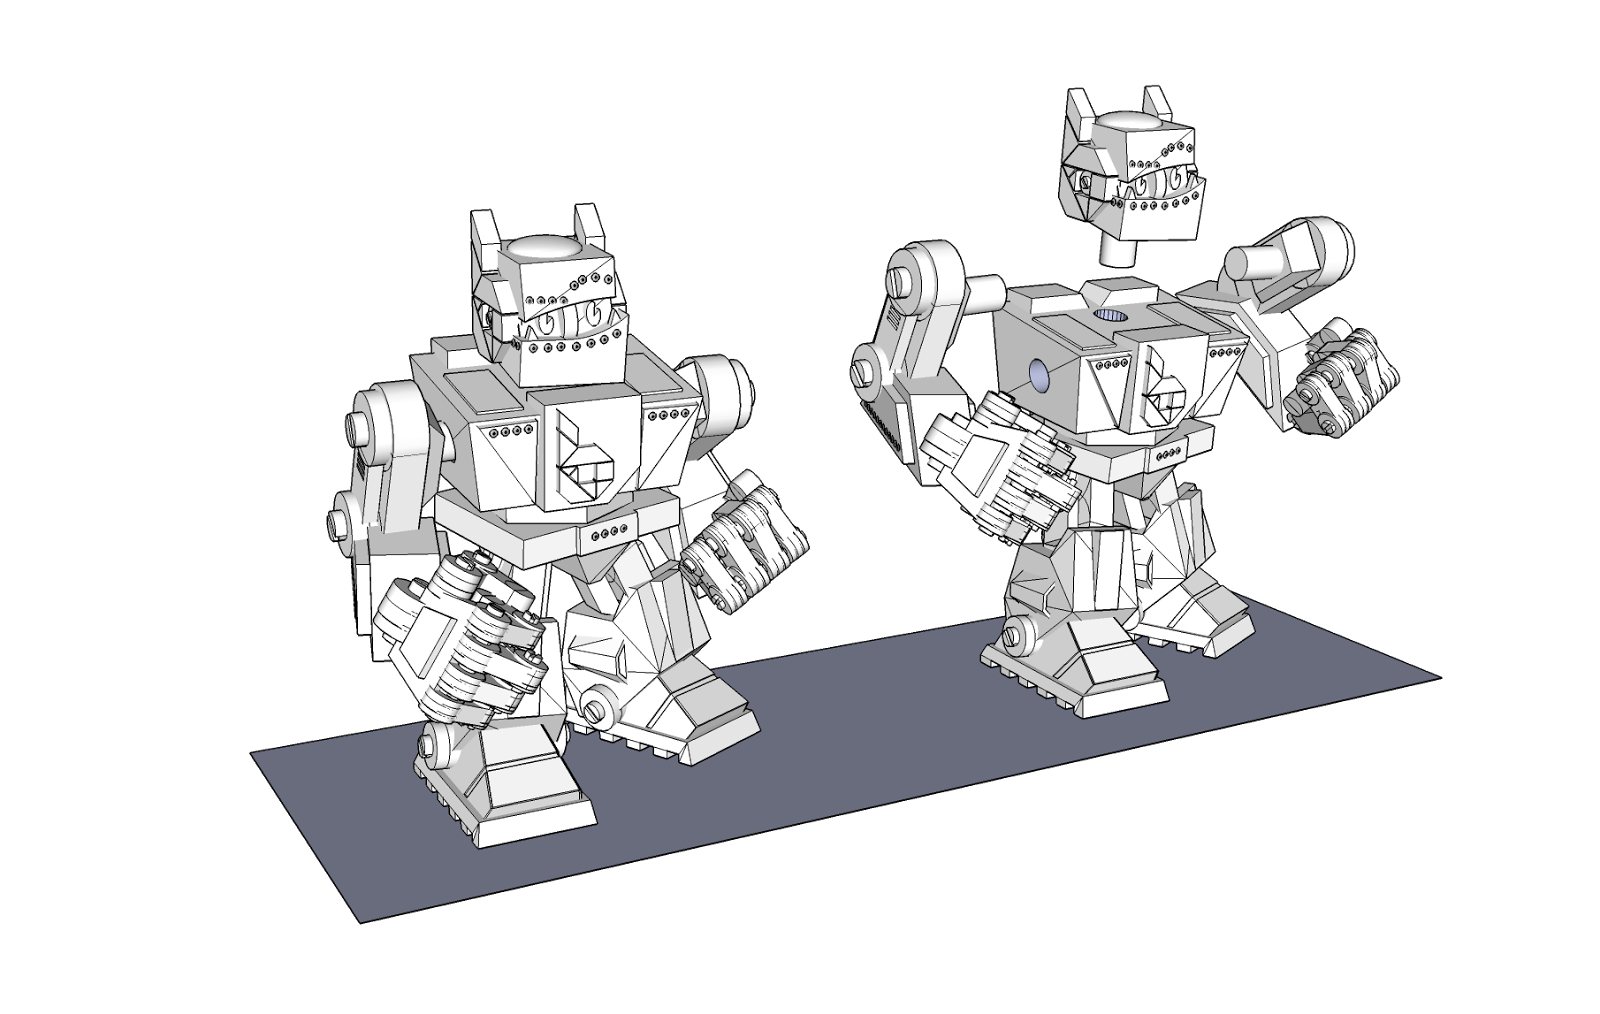 sketchup 3d printing tutorial